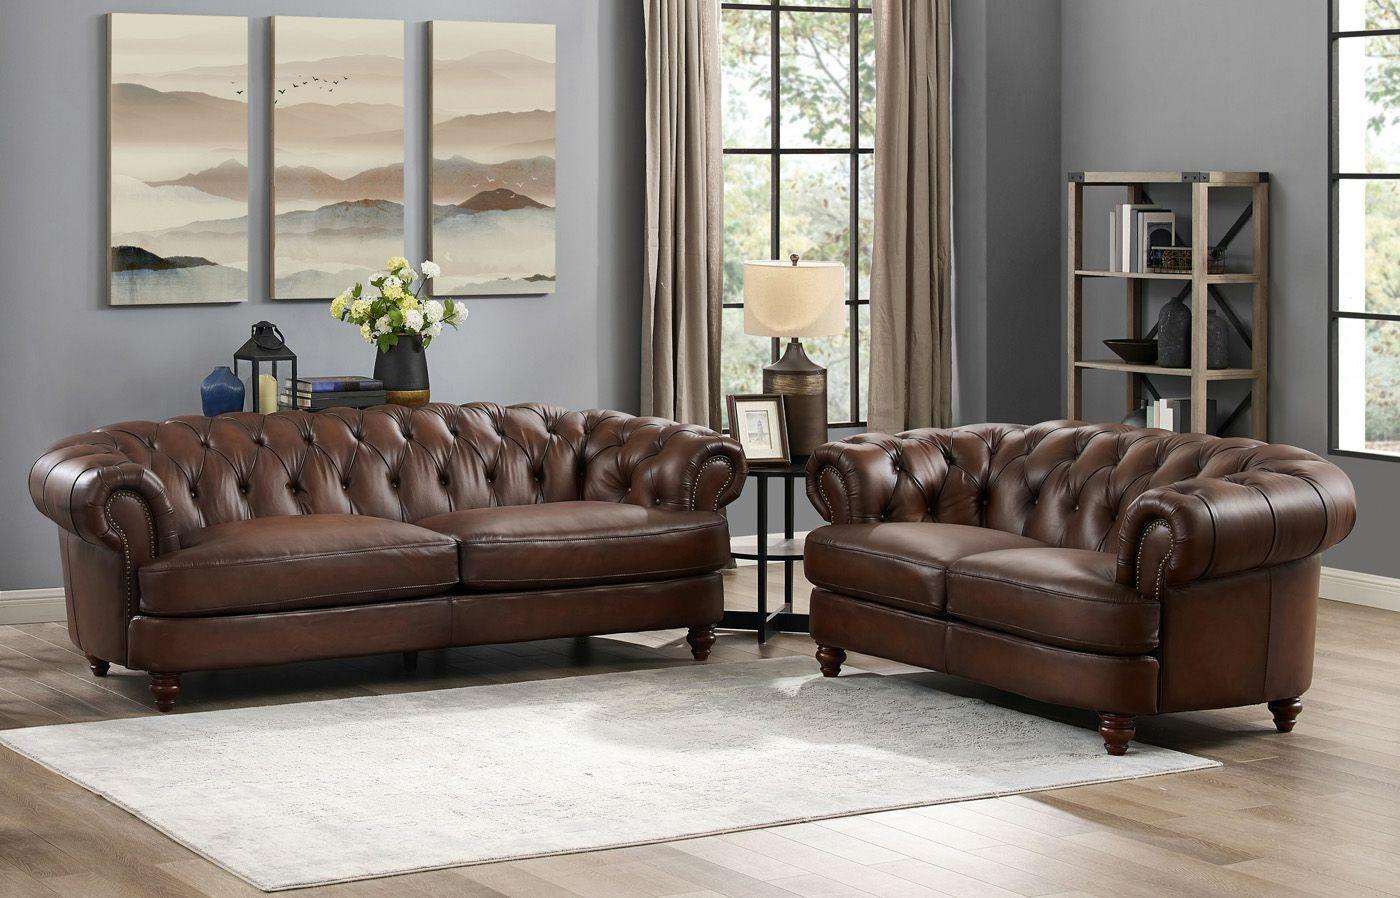 - Mario Top Grain Genuine Brown Leather Chesterfield Sofa Loveseat